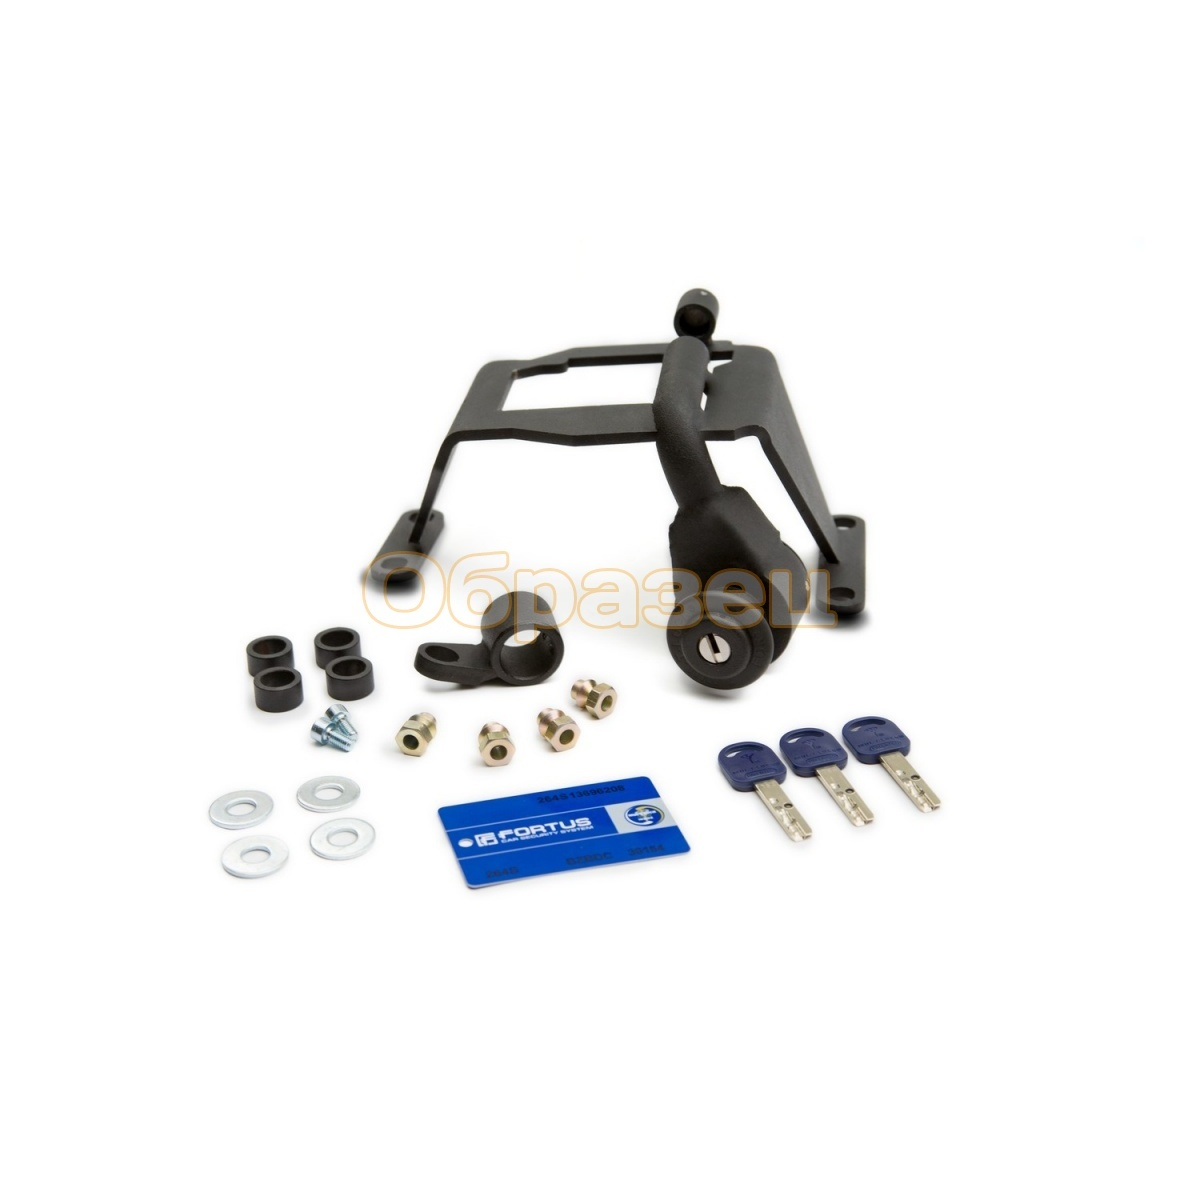 Gearbox lock (MTL) 2058 INT for VW Amarok 2010   6MT Volkswagen Amarok) Car Steering Wheel Lock     - title=